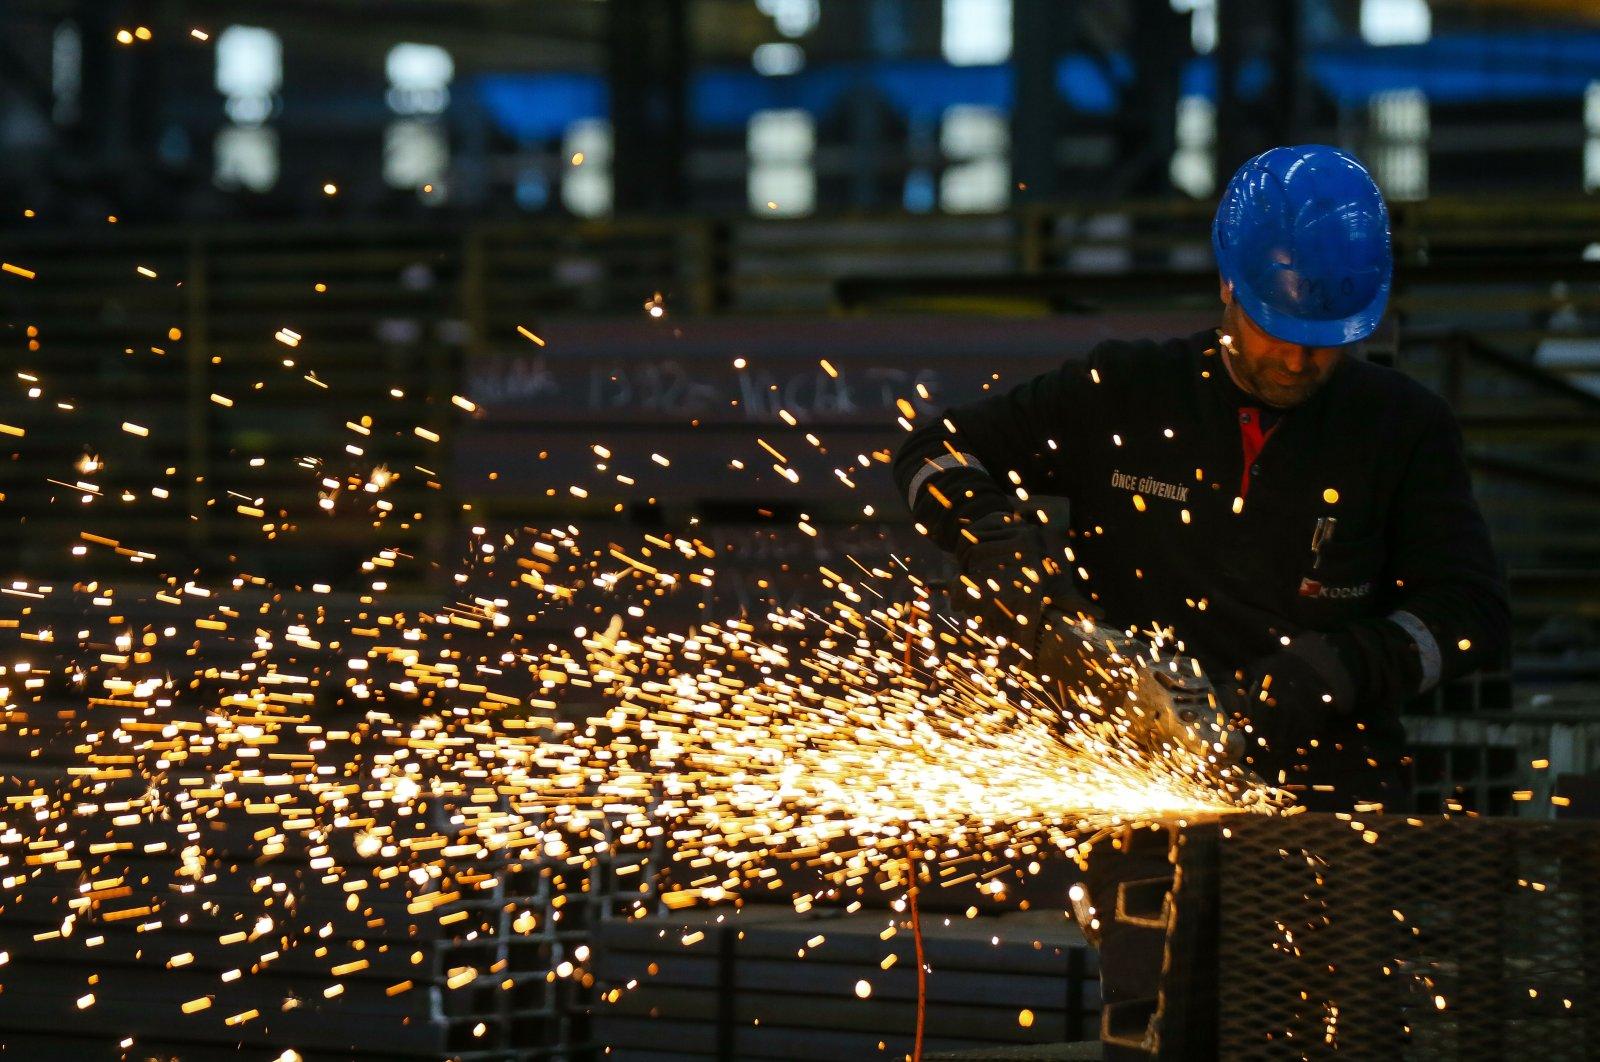 A worker is seen at a steel factory in Aliağa, western Izmir province, Turkey, Nov. 12, 2019. (AA Photo)